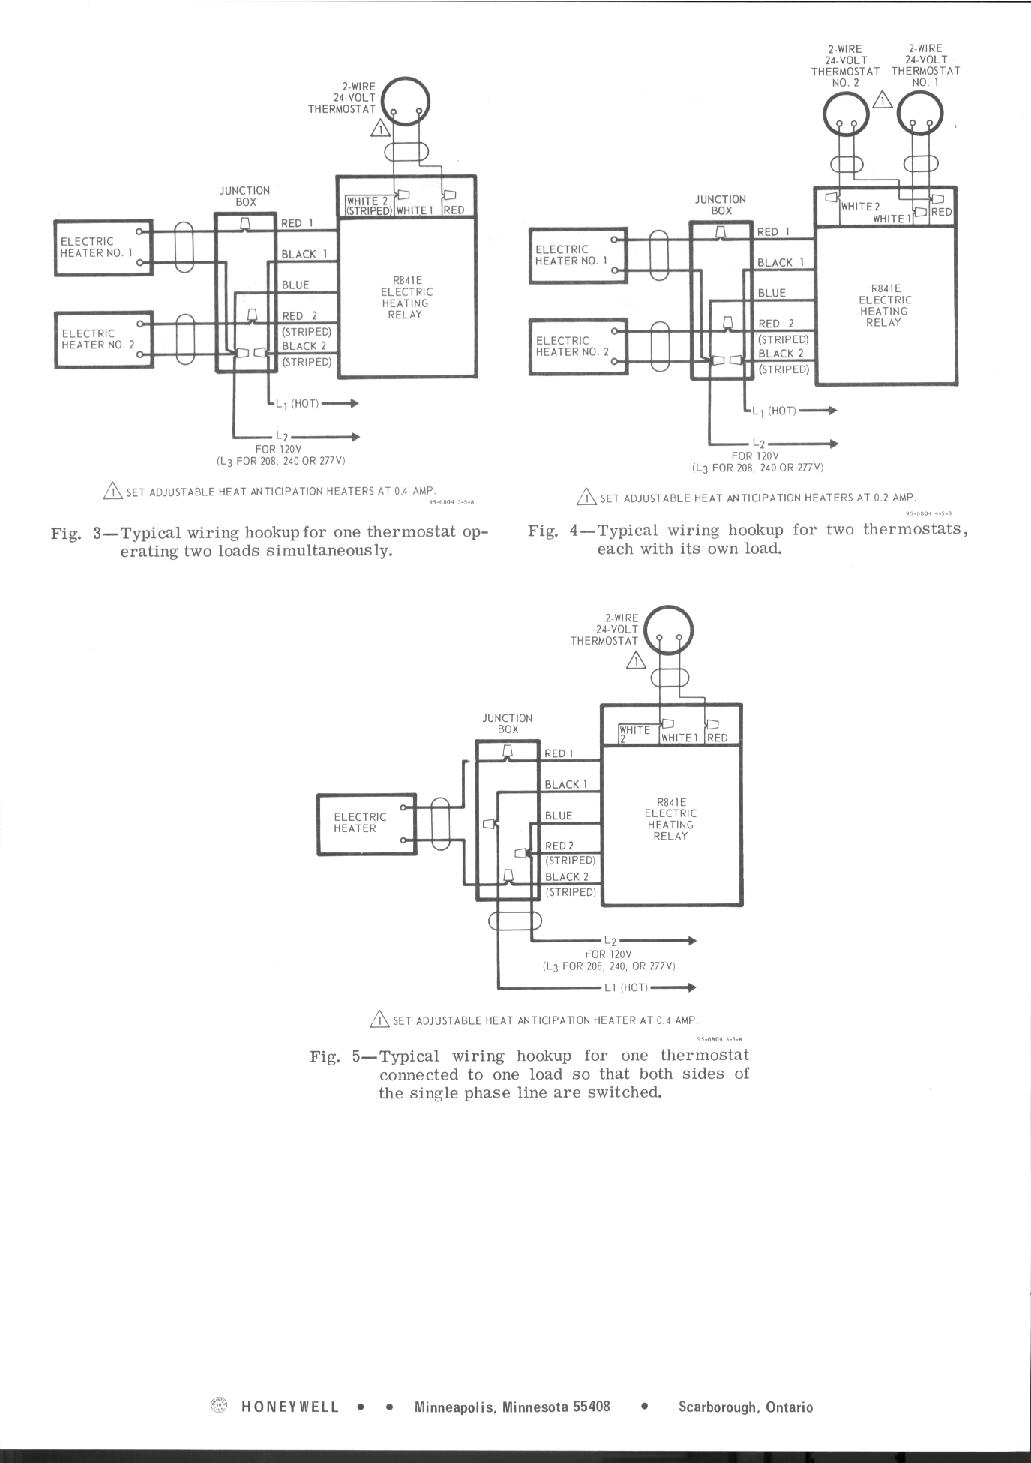 Diagram Honeywell Ct410b Wiring Diagram Full Version Hd Quality Wiring Diagram Diagramusaxl Joliotcurieaubiere Fr